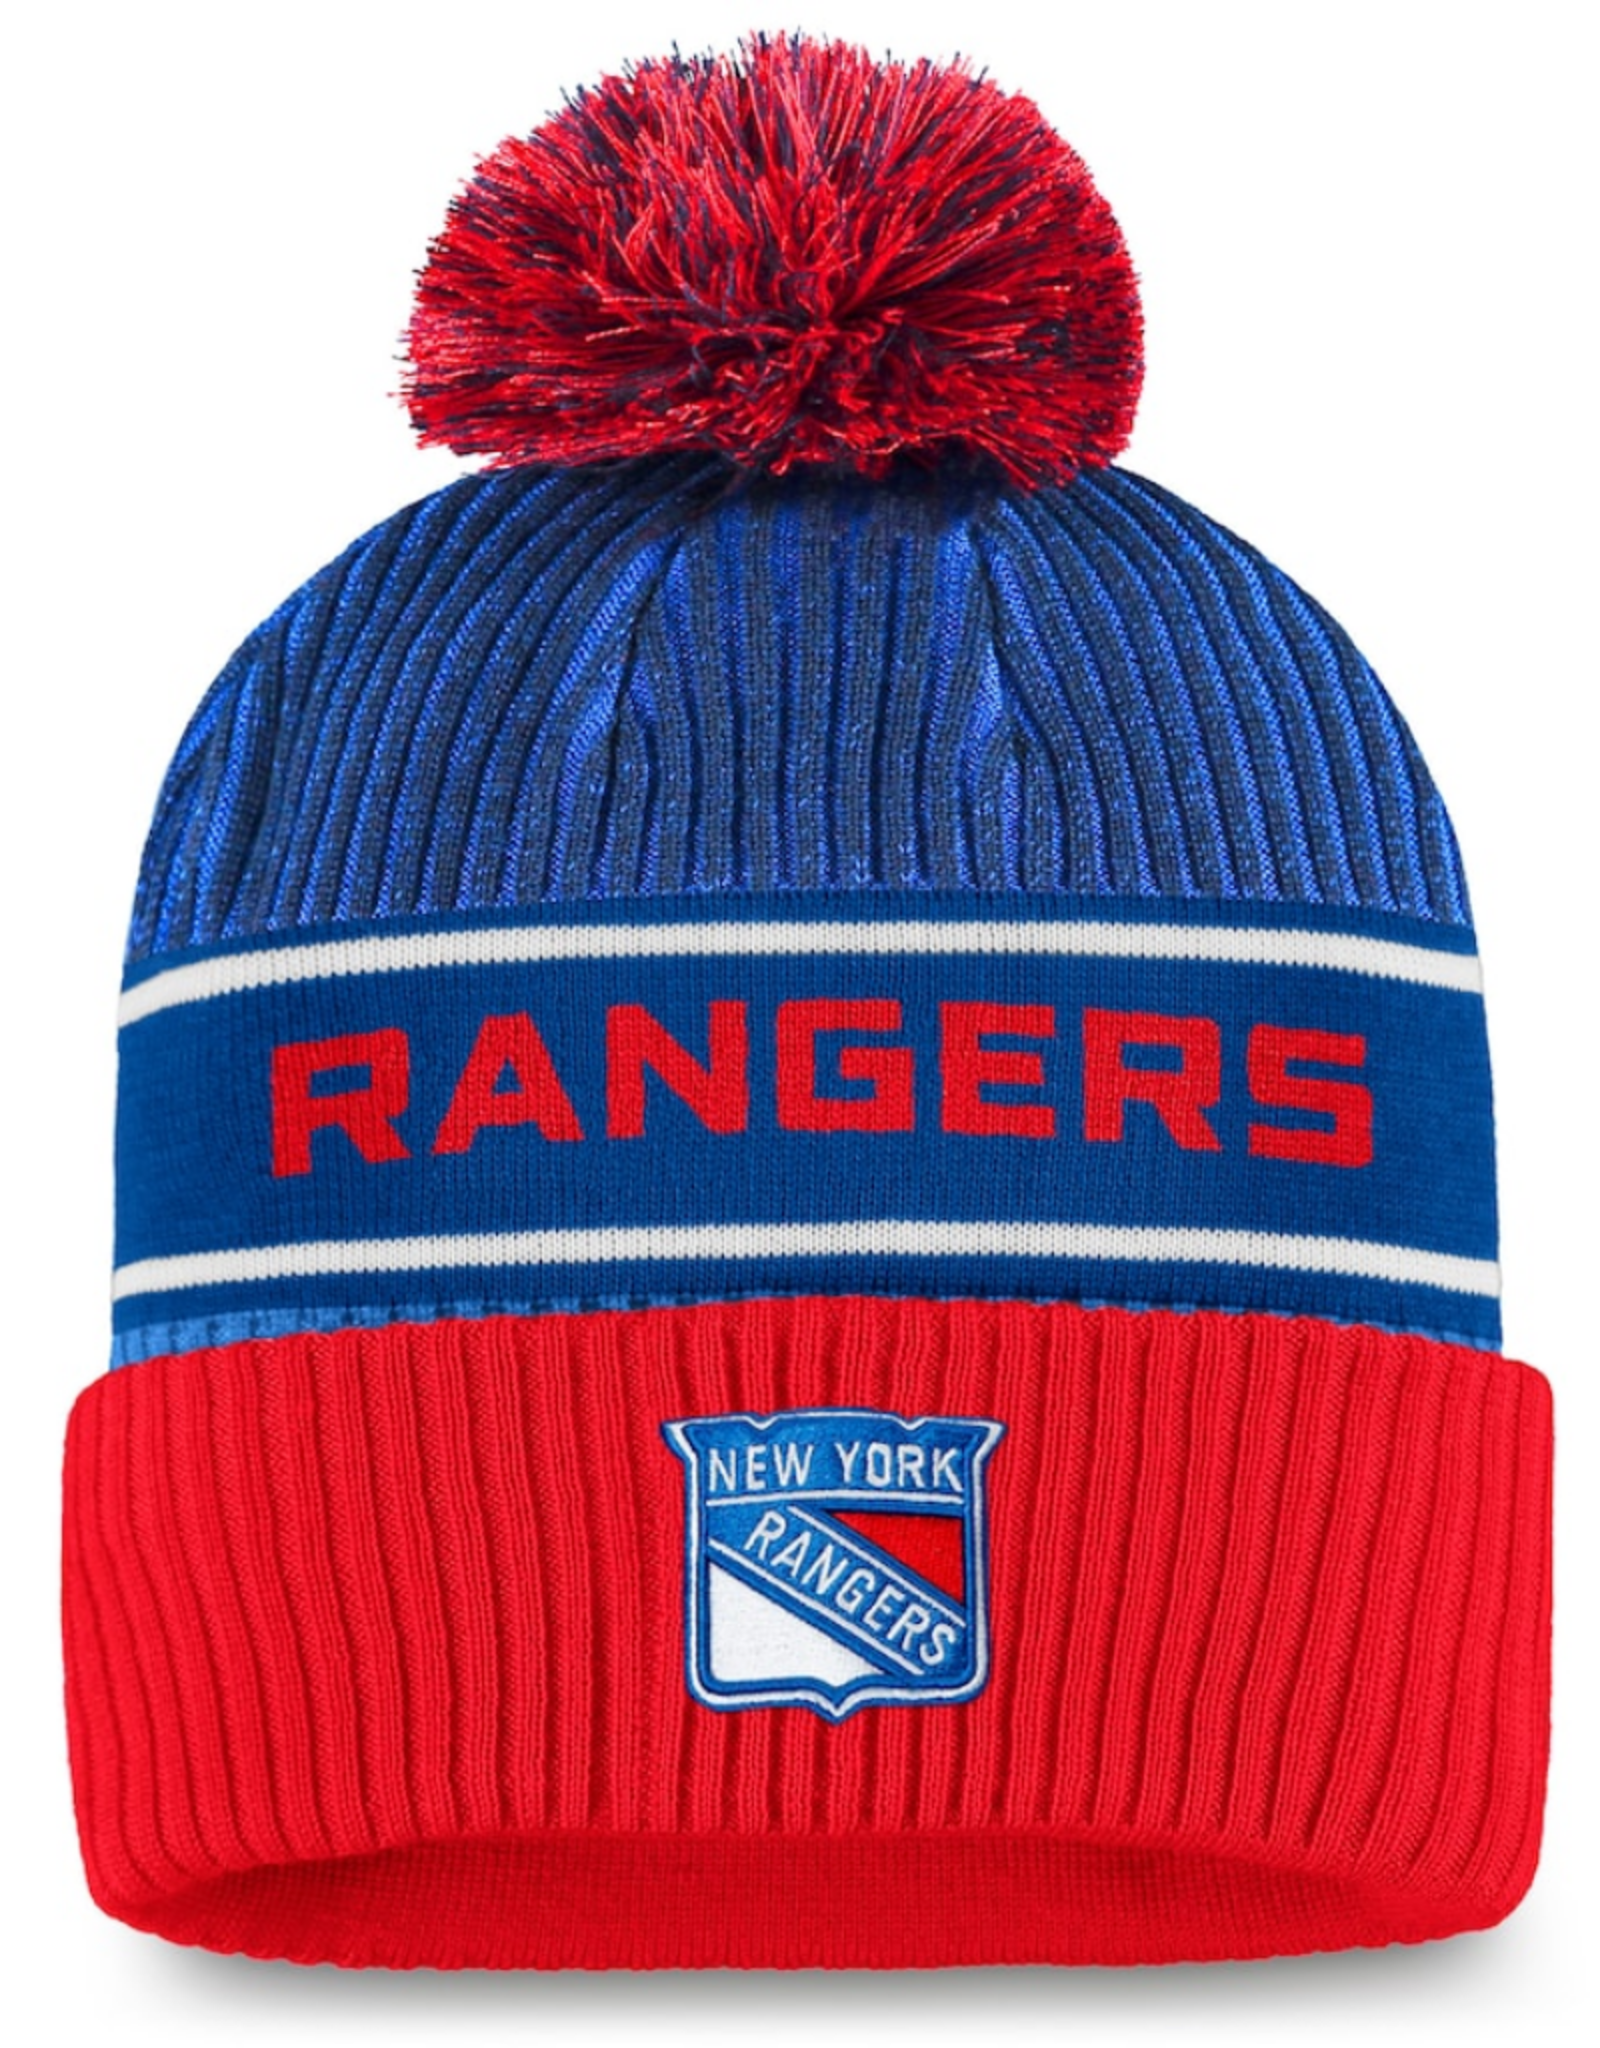 Fanatics Fanatics Men's '20 Locker Pom Knit New York Rangers Blue